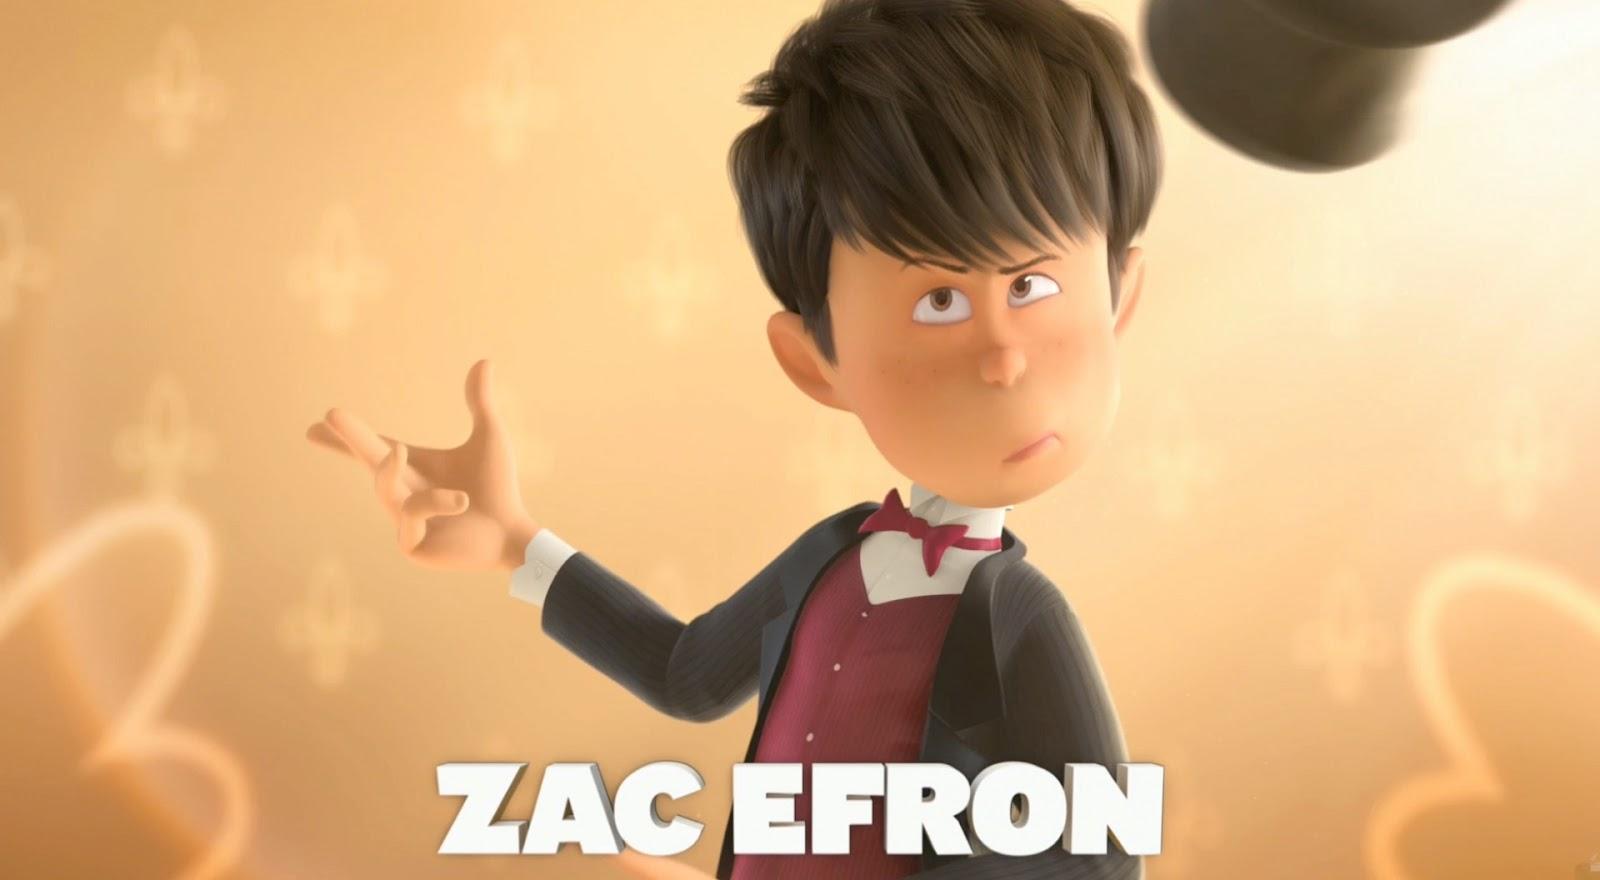 http://2.bp.blogspot.com/-330Zrzm-FRg/T1WllxJiMOI/AAAAAAAAINQ/6cm1Kw1lN-Q/s1600/zac_efron_is_ted.jpg